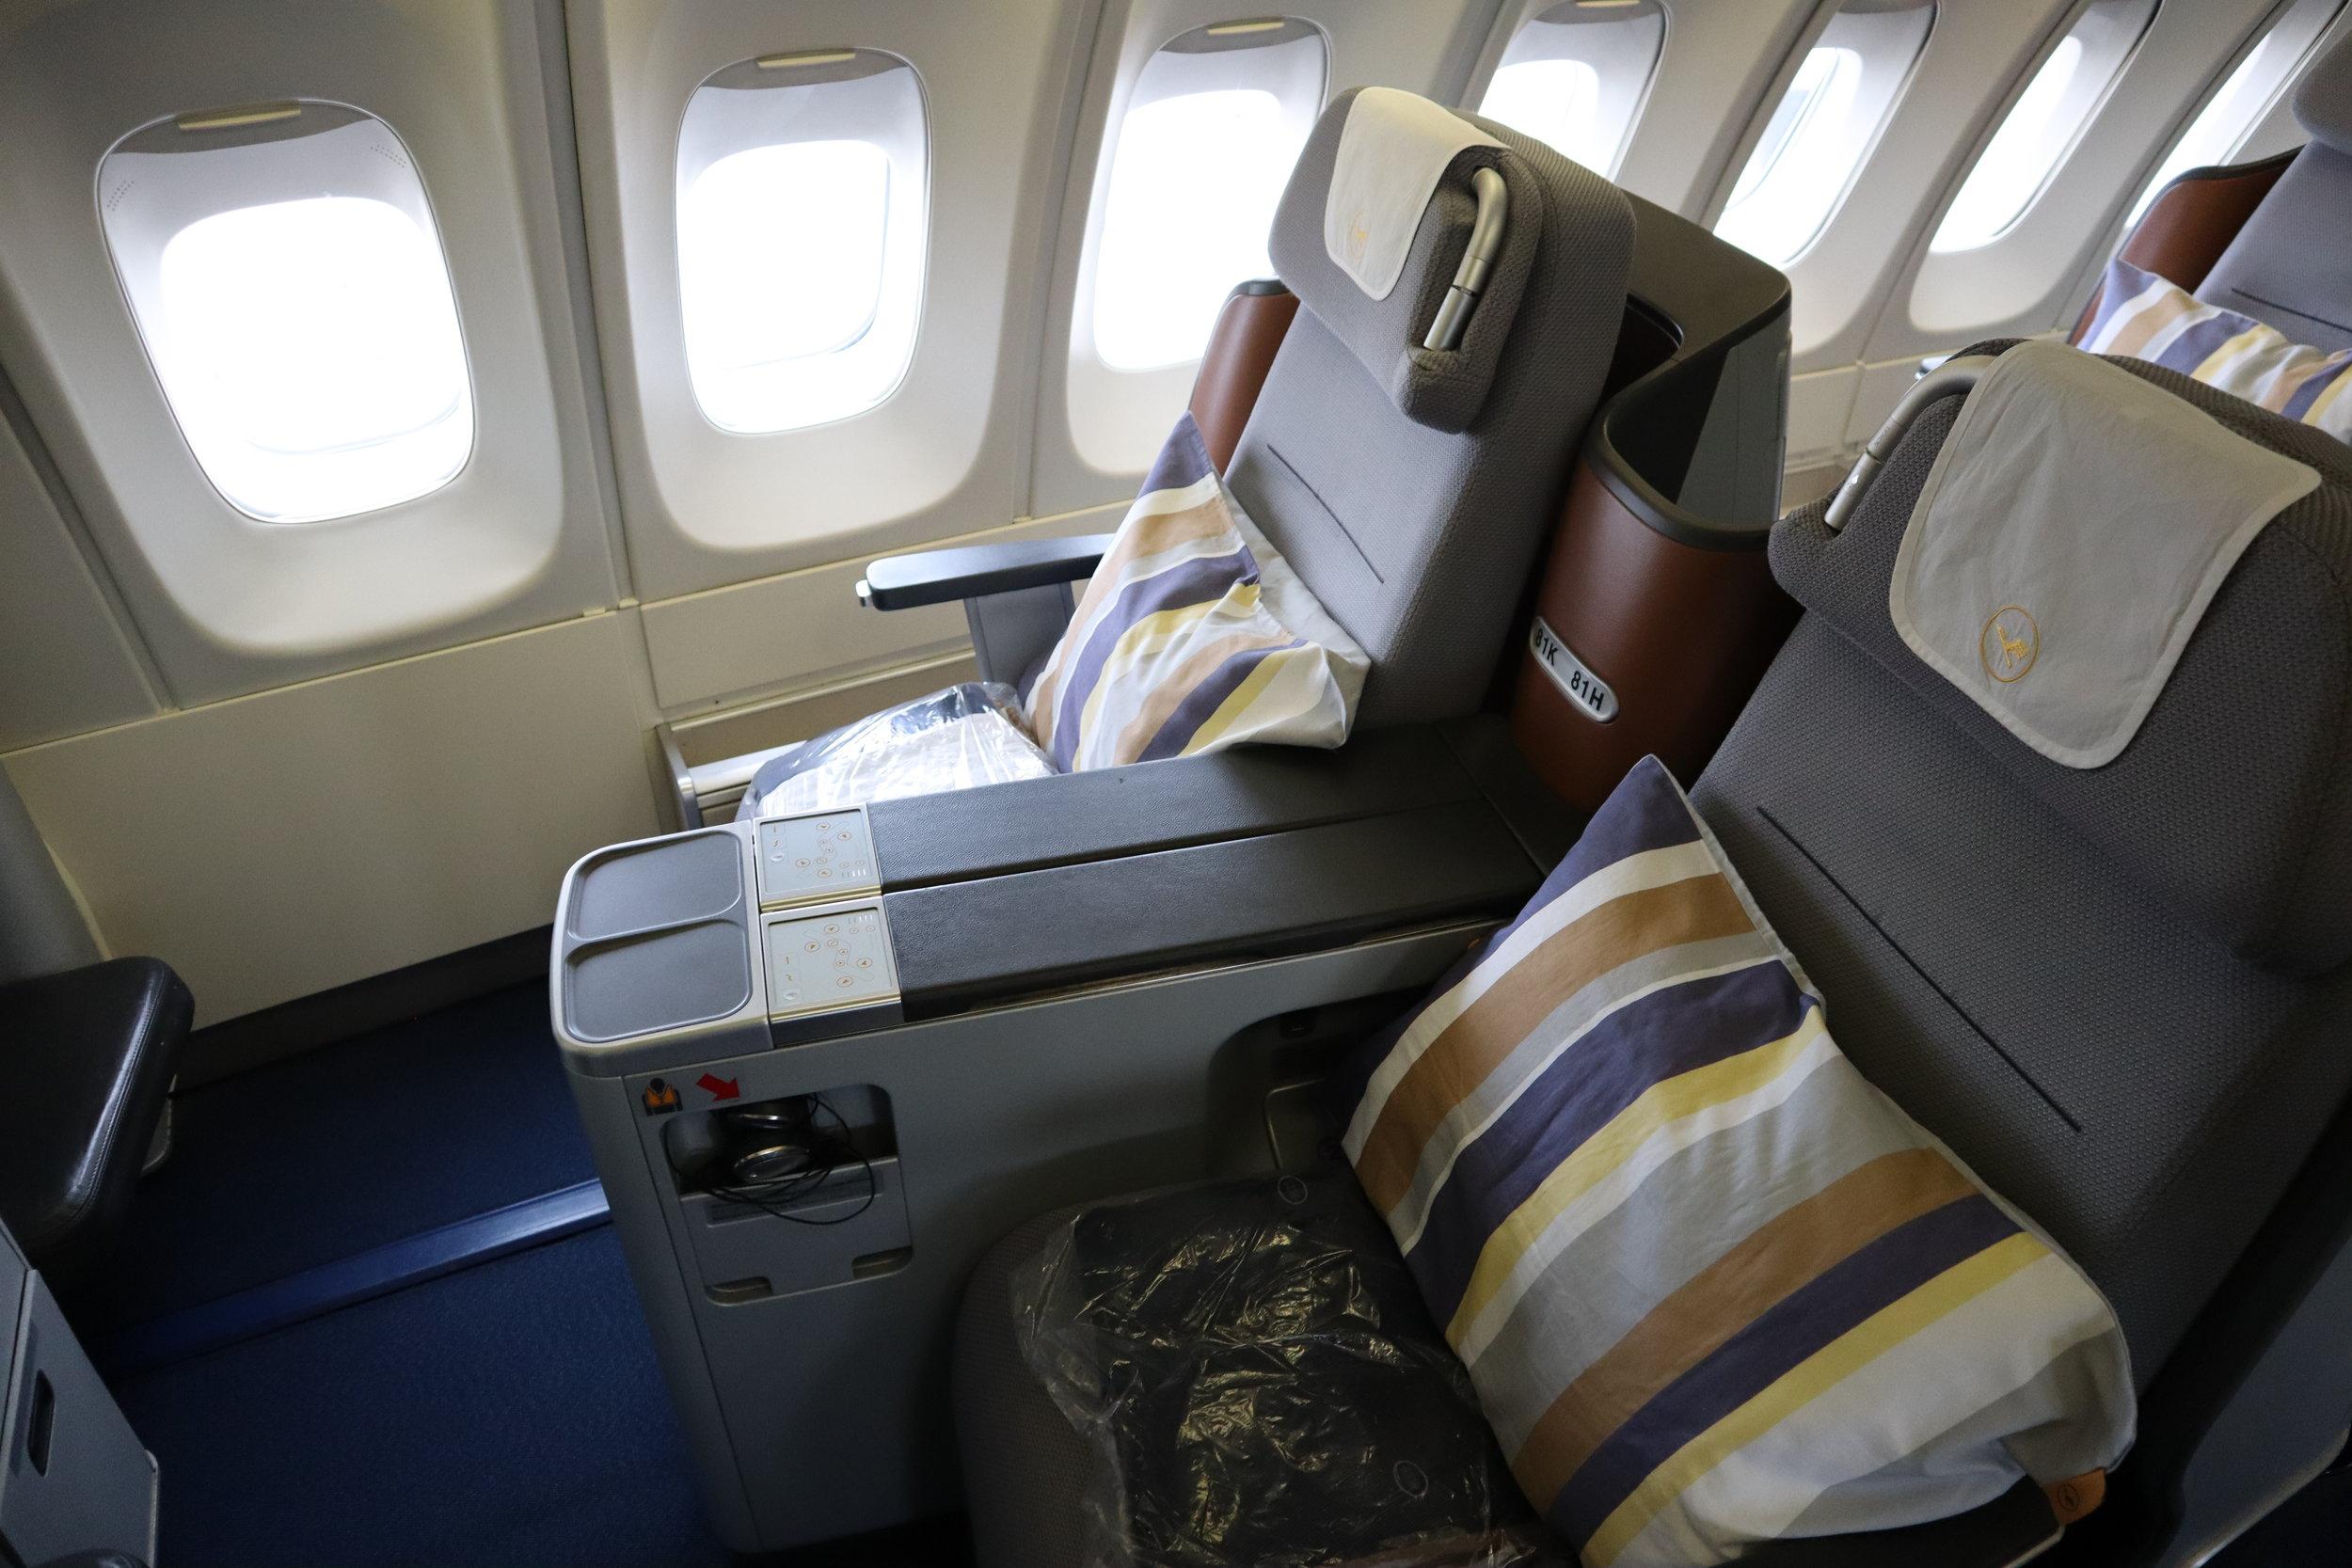 Lufthansa 747-400 business class – Seats 81H and 81K